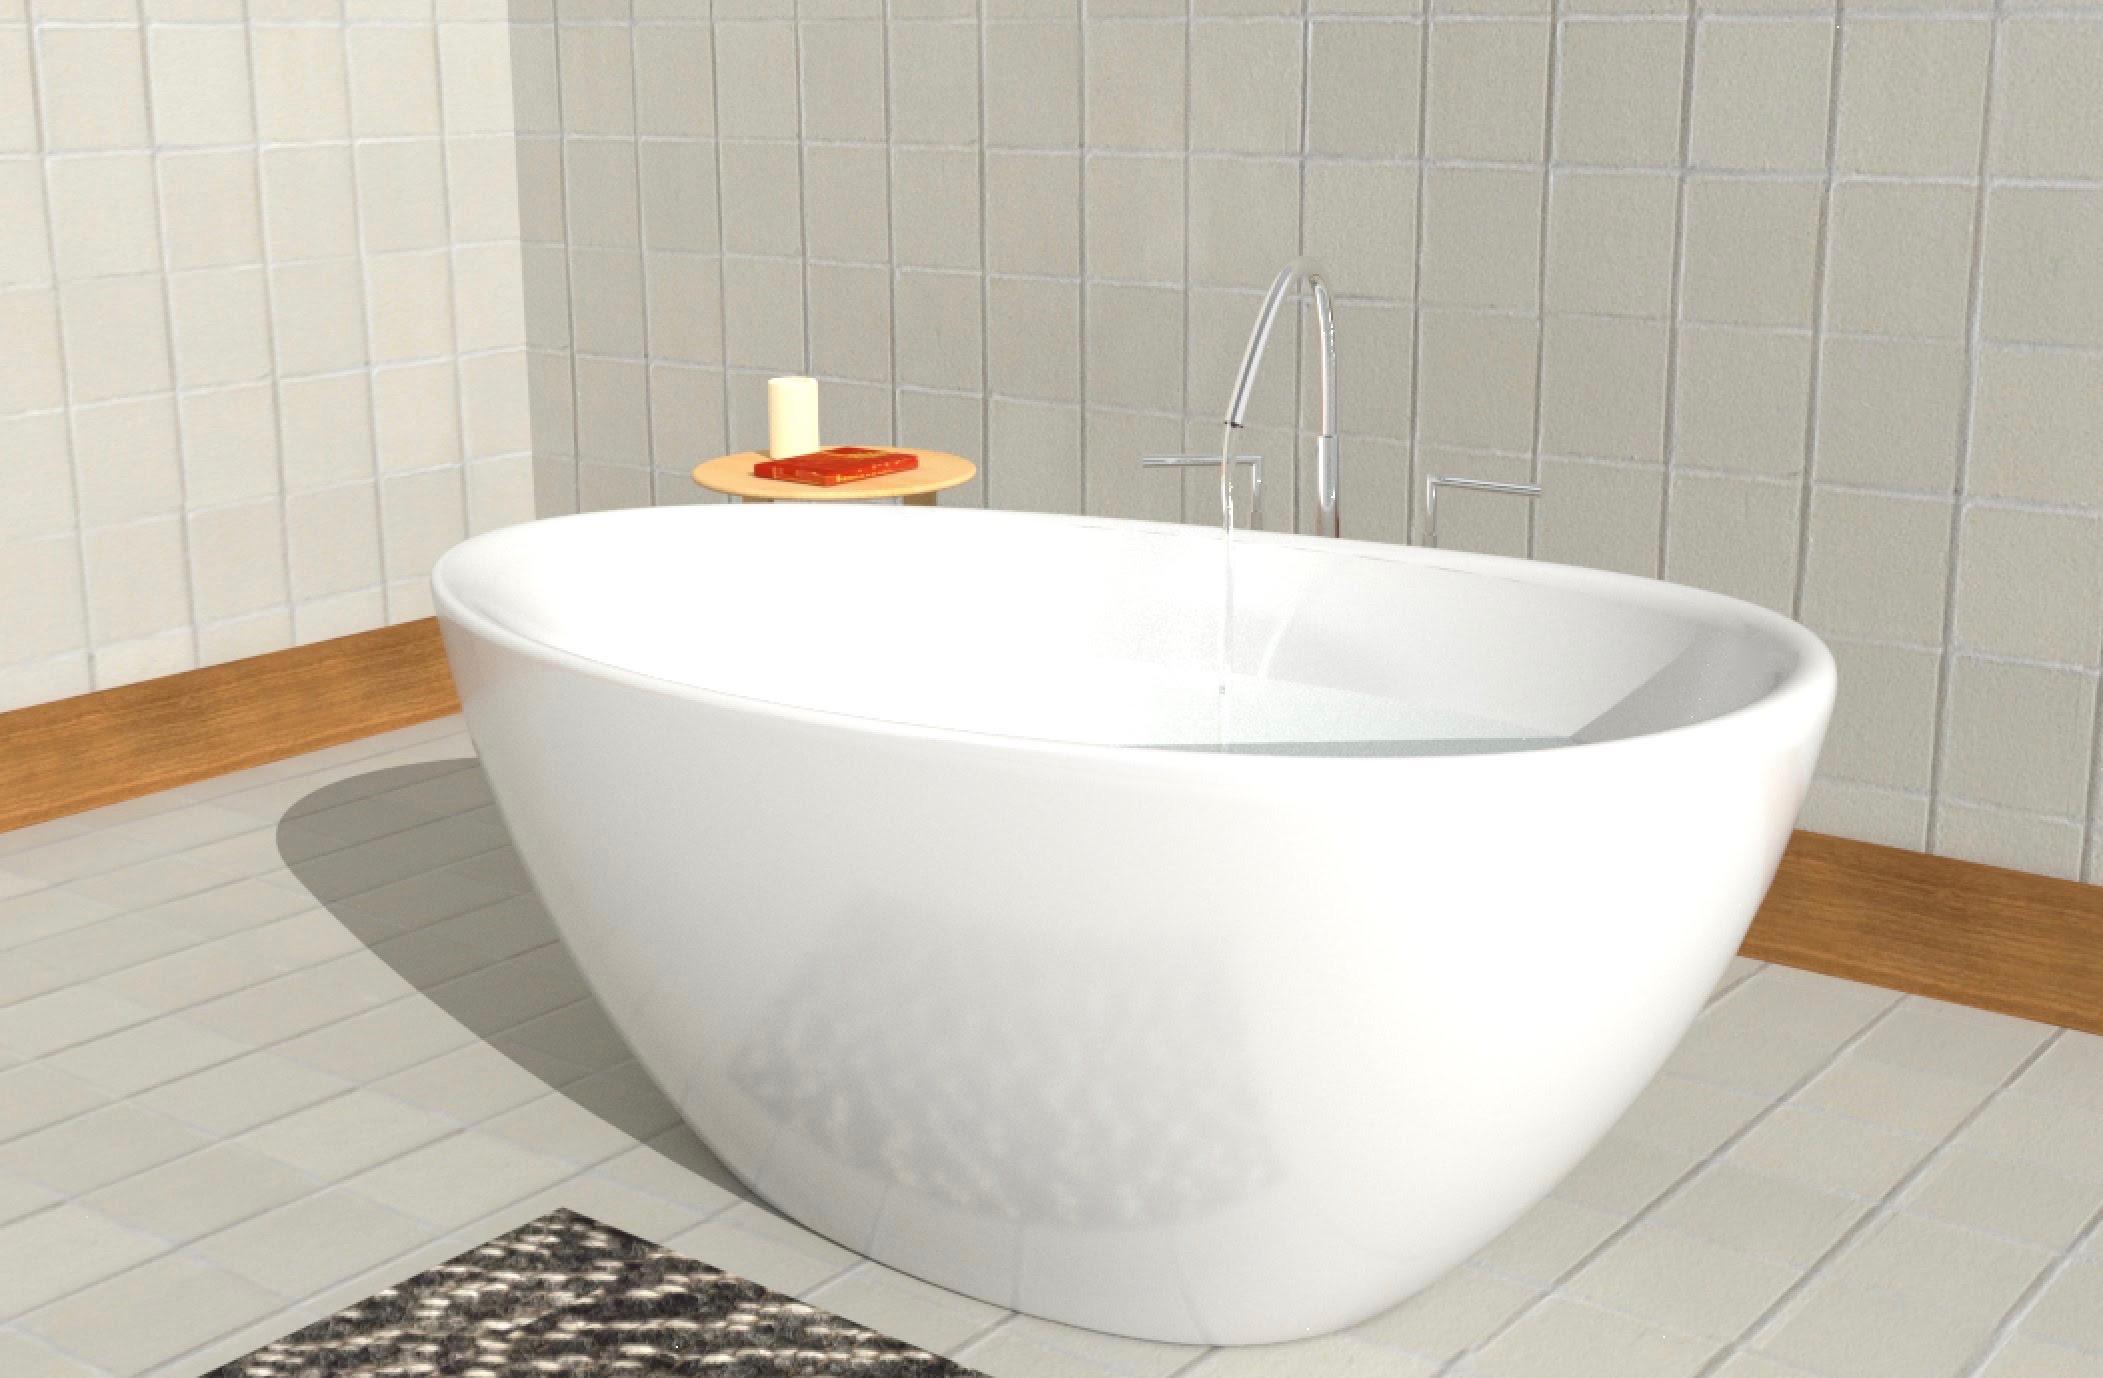 bathtub7 2.jpg